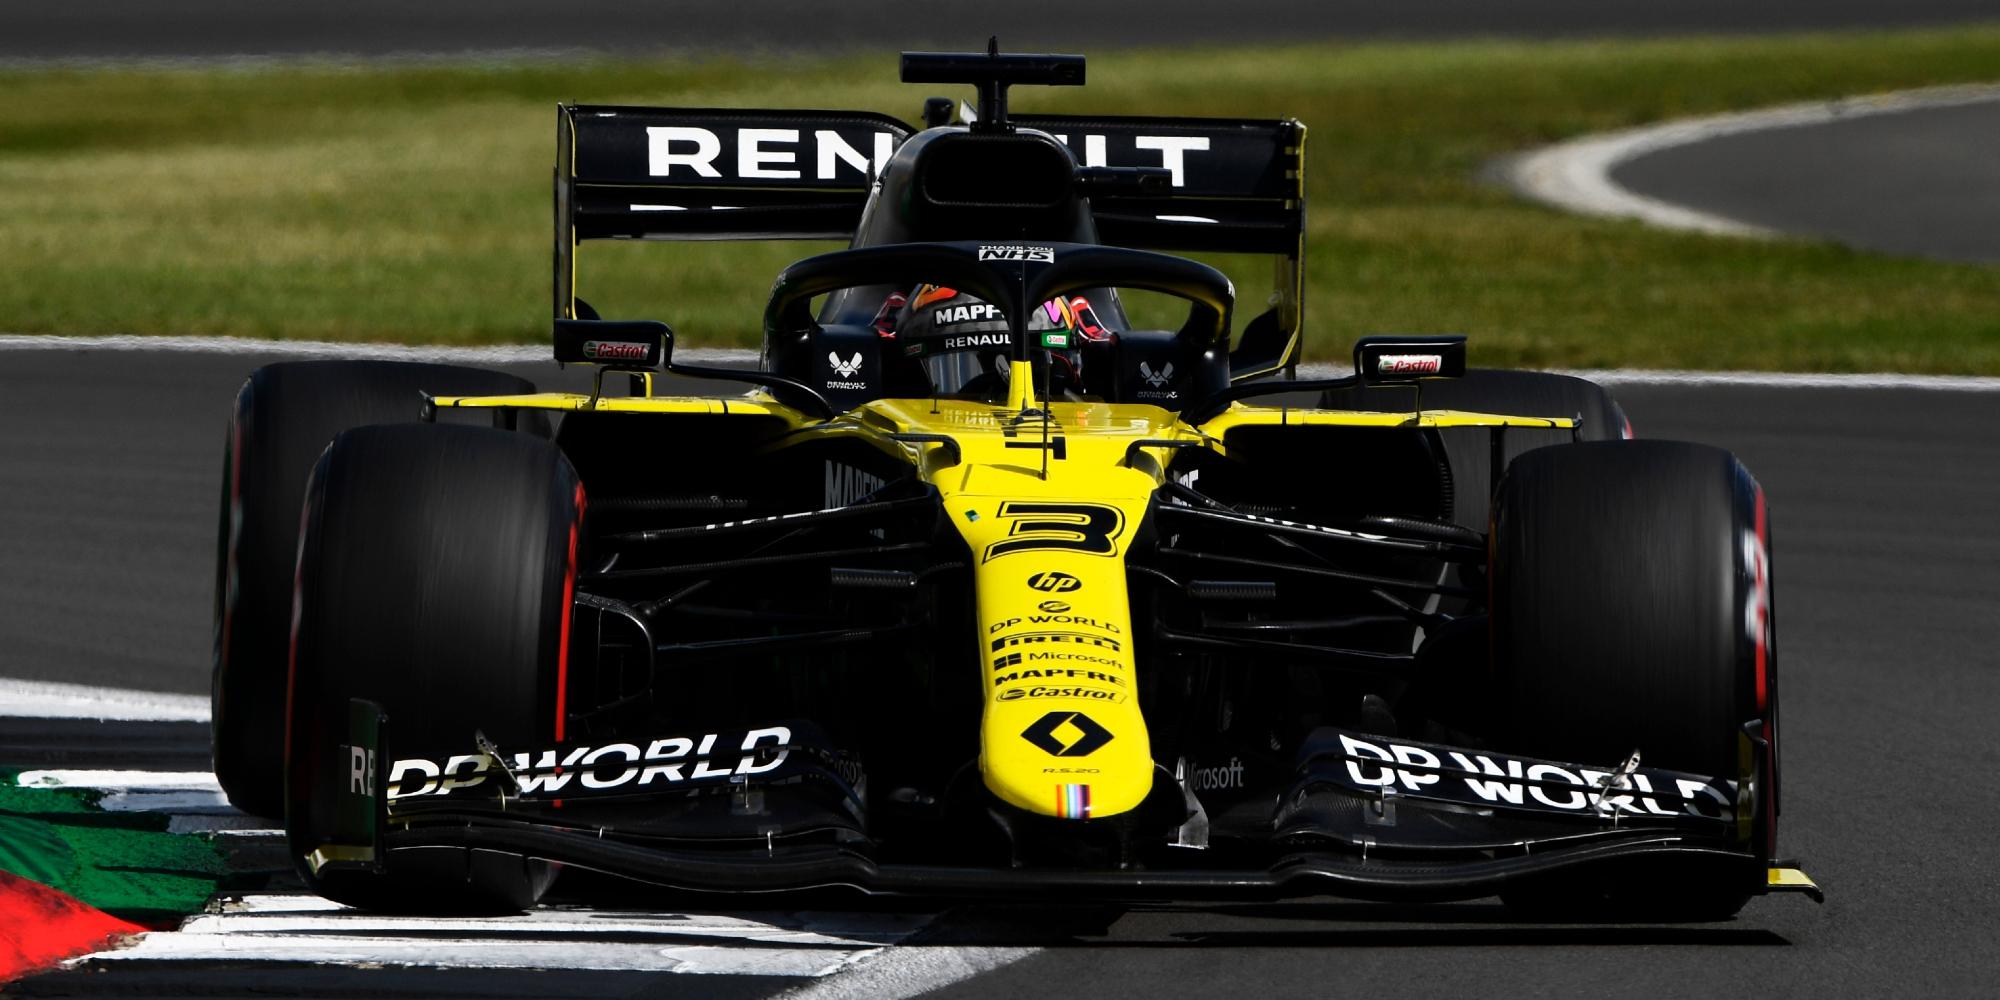 2020 British GP, Daniel Ricciardo